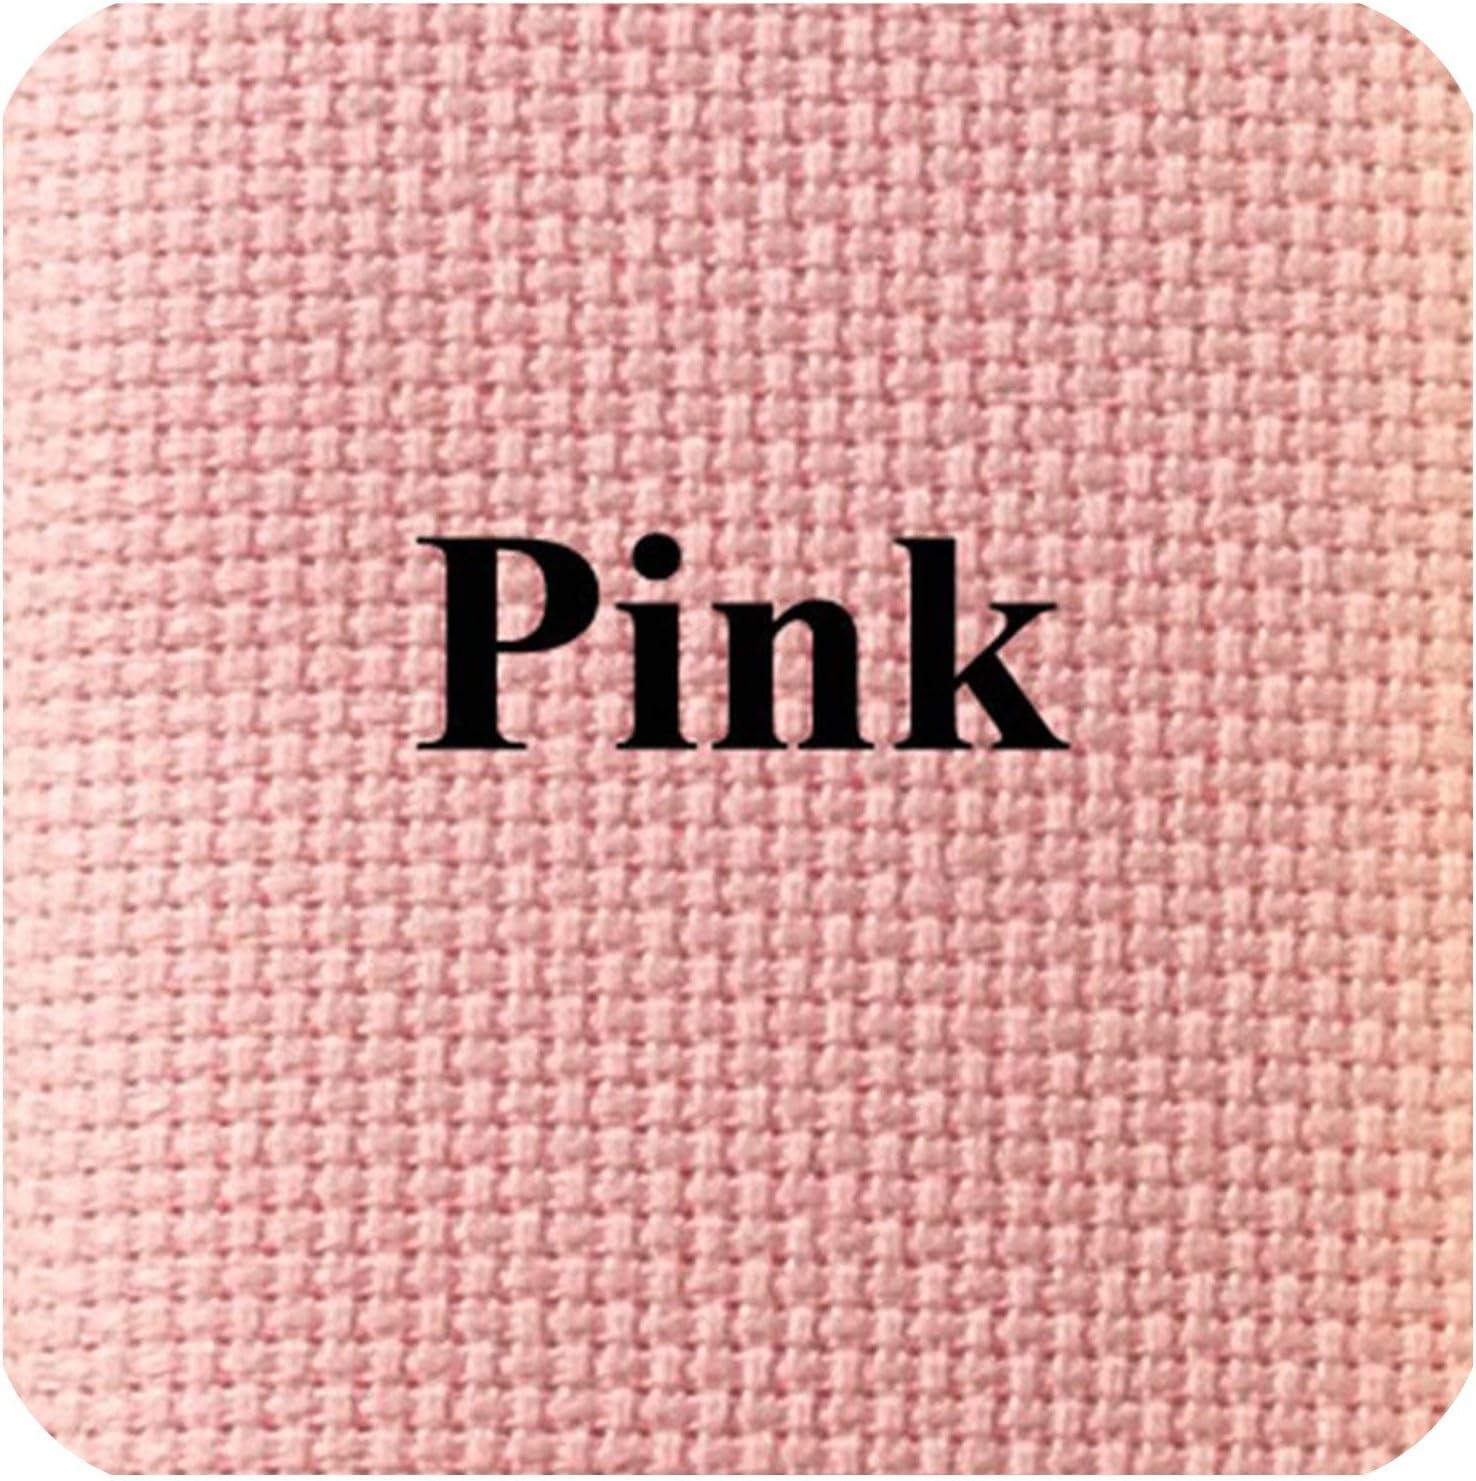 25X25Cm 14Ct White Cloth Pink Black Flaxen Green Cross Stitch Fabric Canvas DIY Handmade Needlework,Beige,25X25Cm